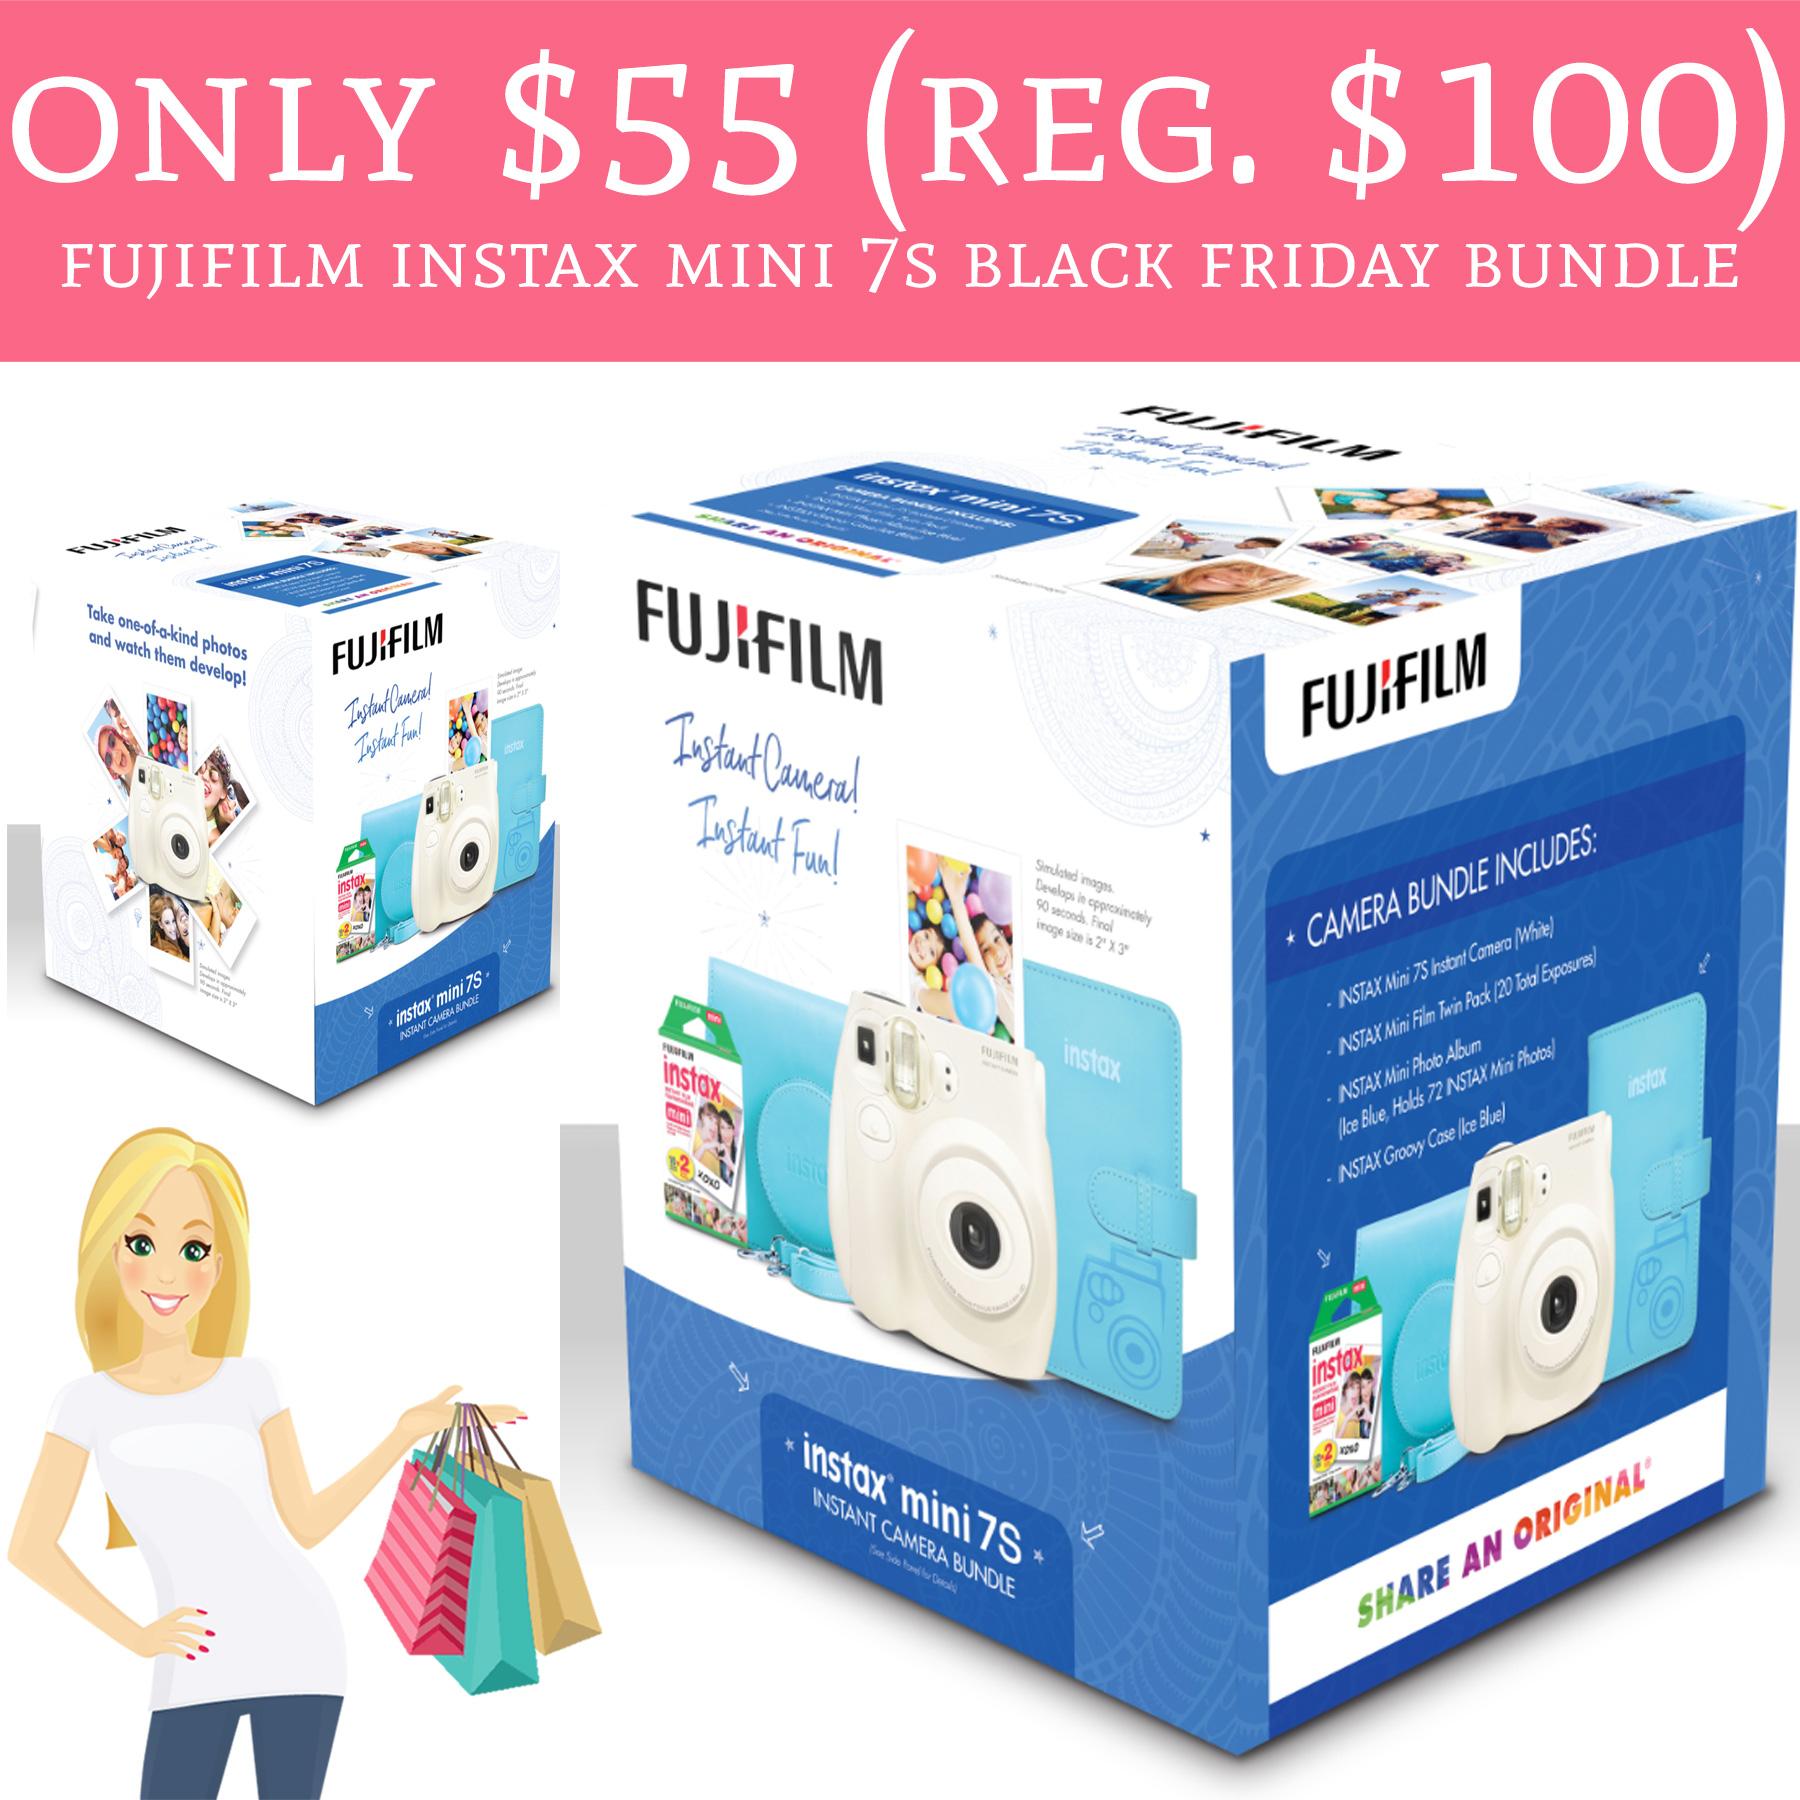 only 55 regular 100 fujifilm instax mini 7s black friday bundle deal hunting babe. Black Bedroom Furniture Sets. Home Design Ideas